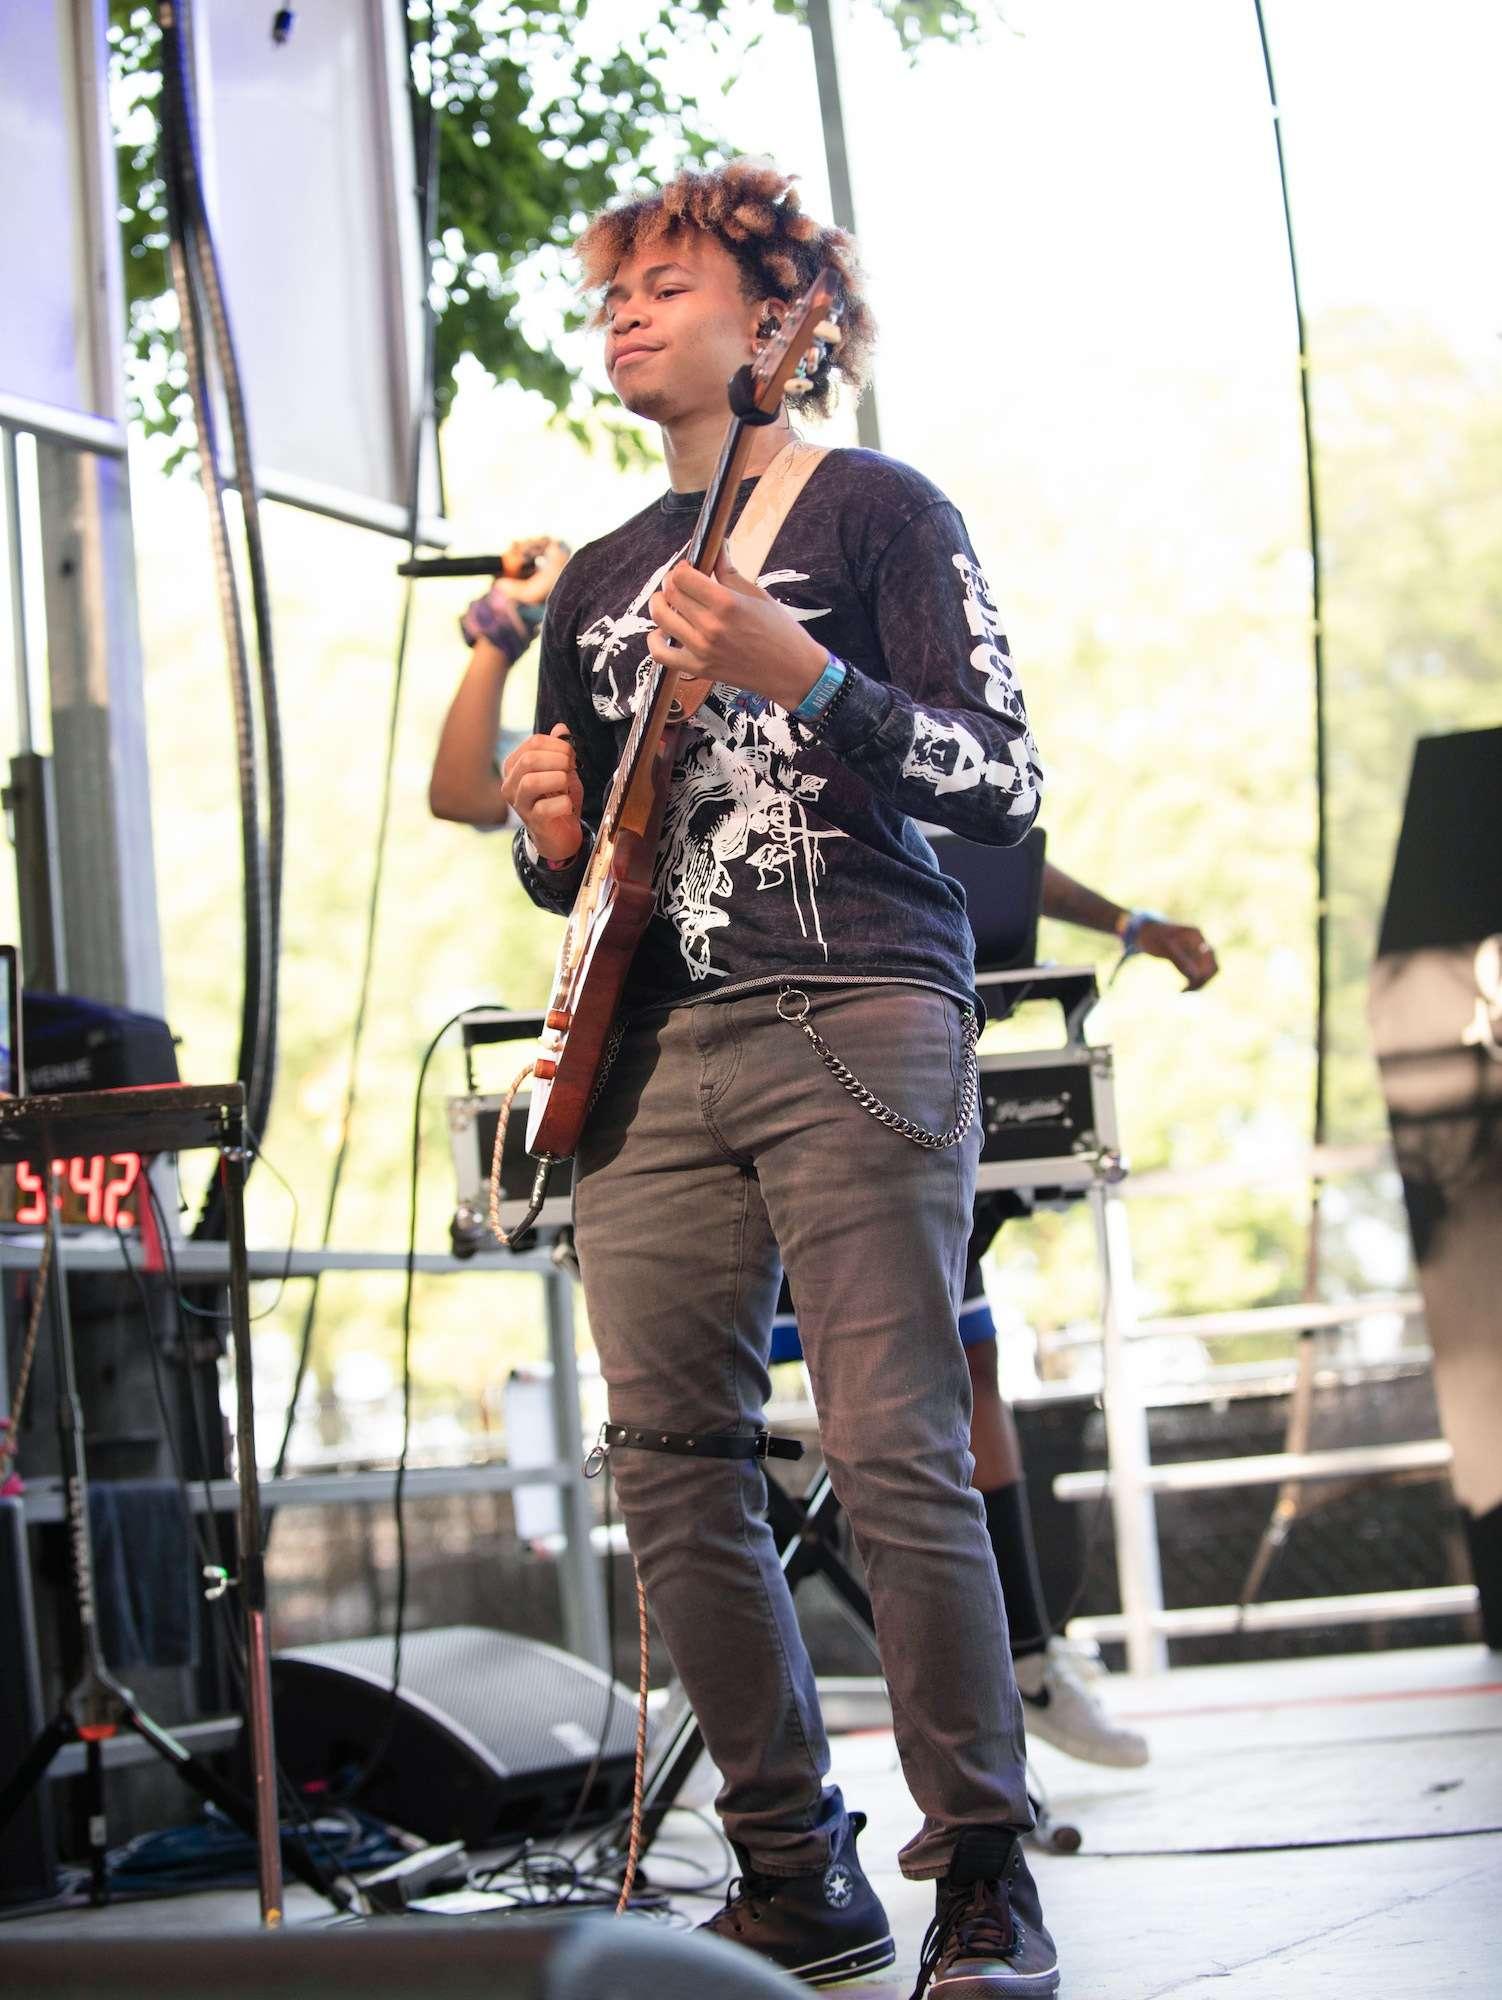 Serena Isioma Live at Lollapalooza [GALLERY] 6